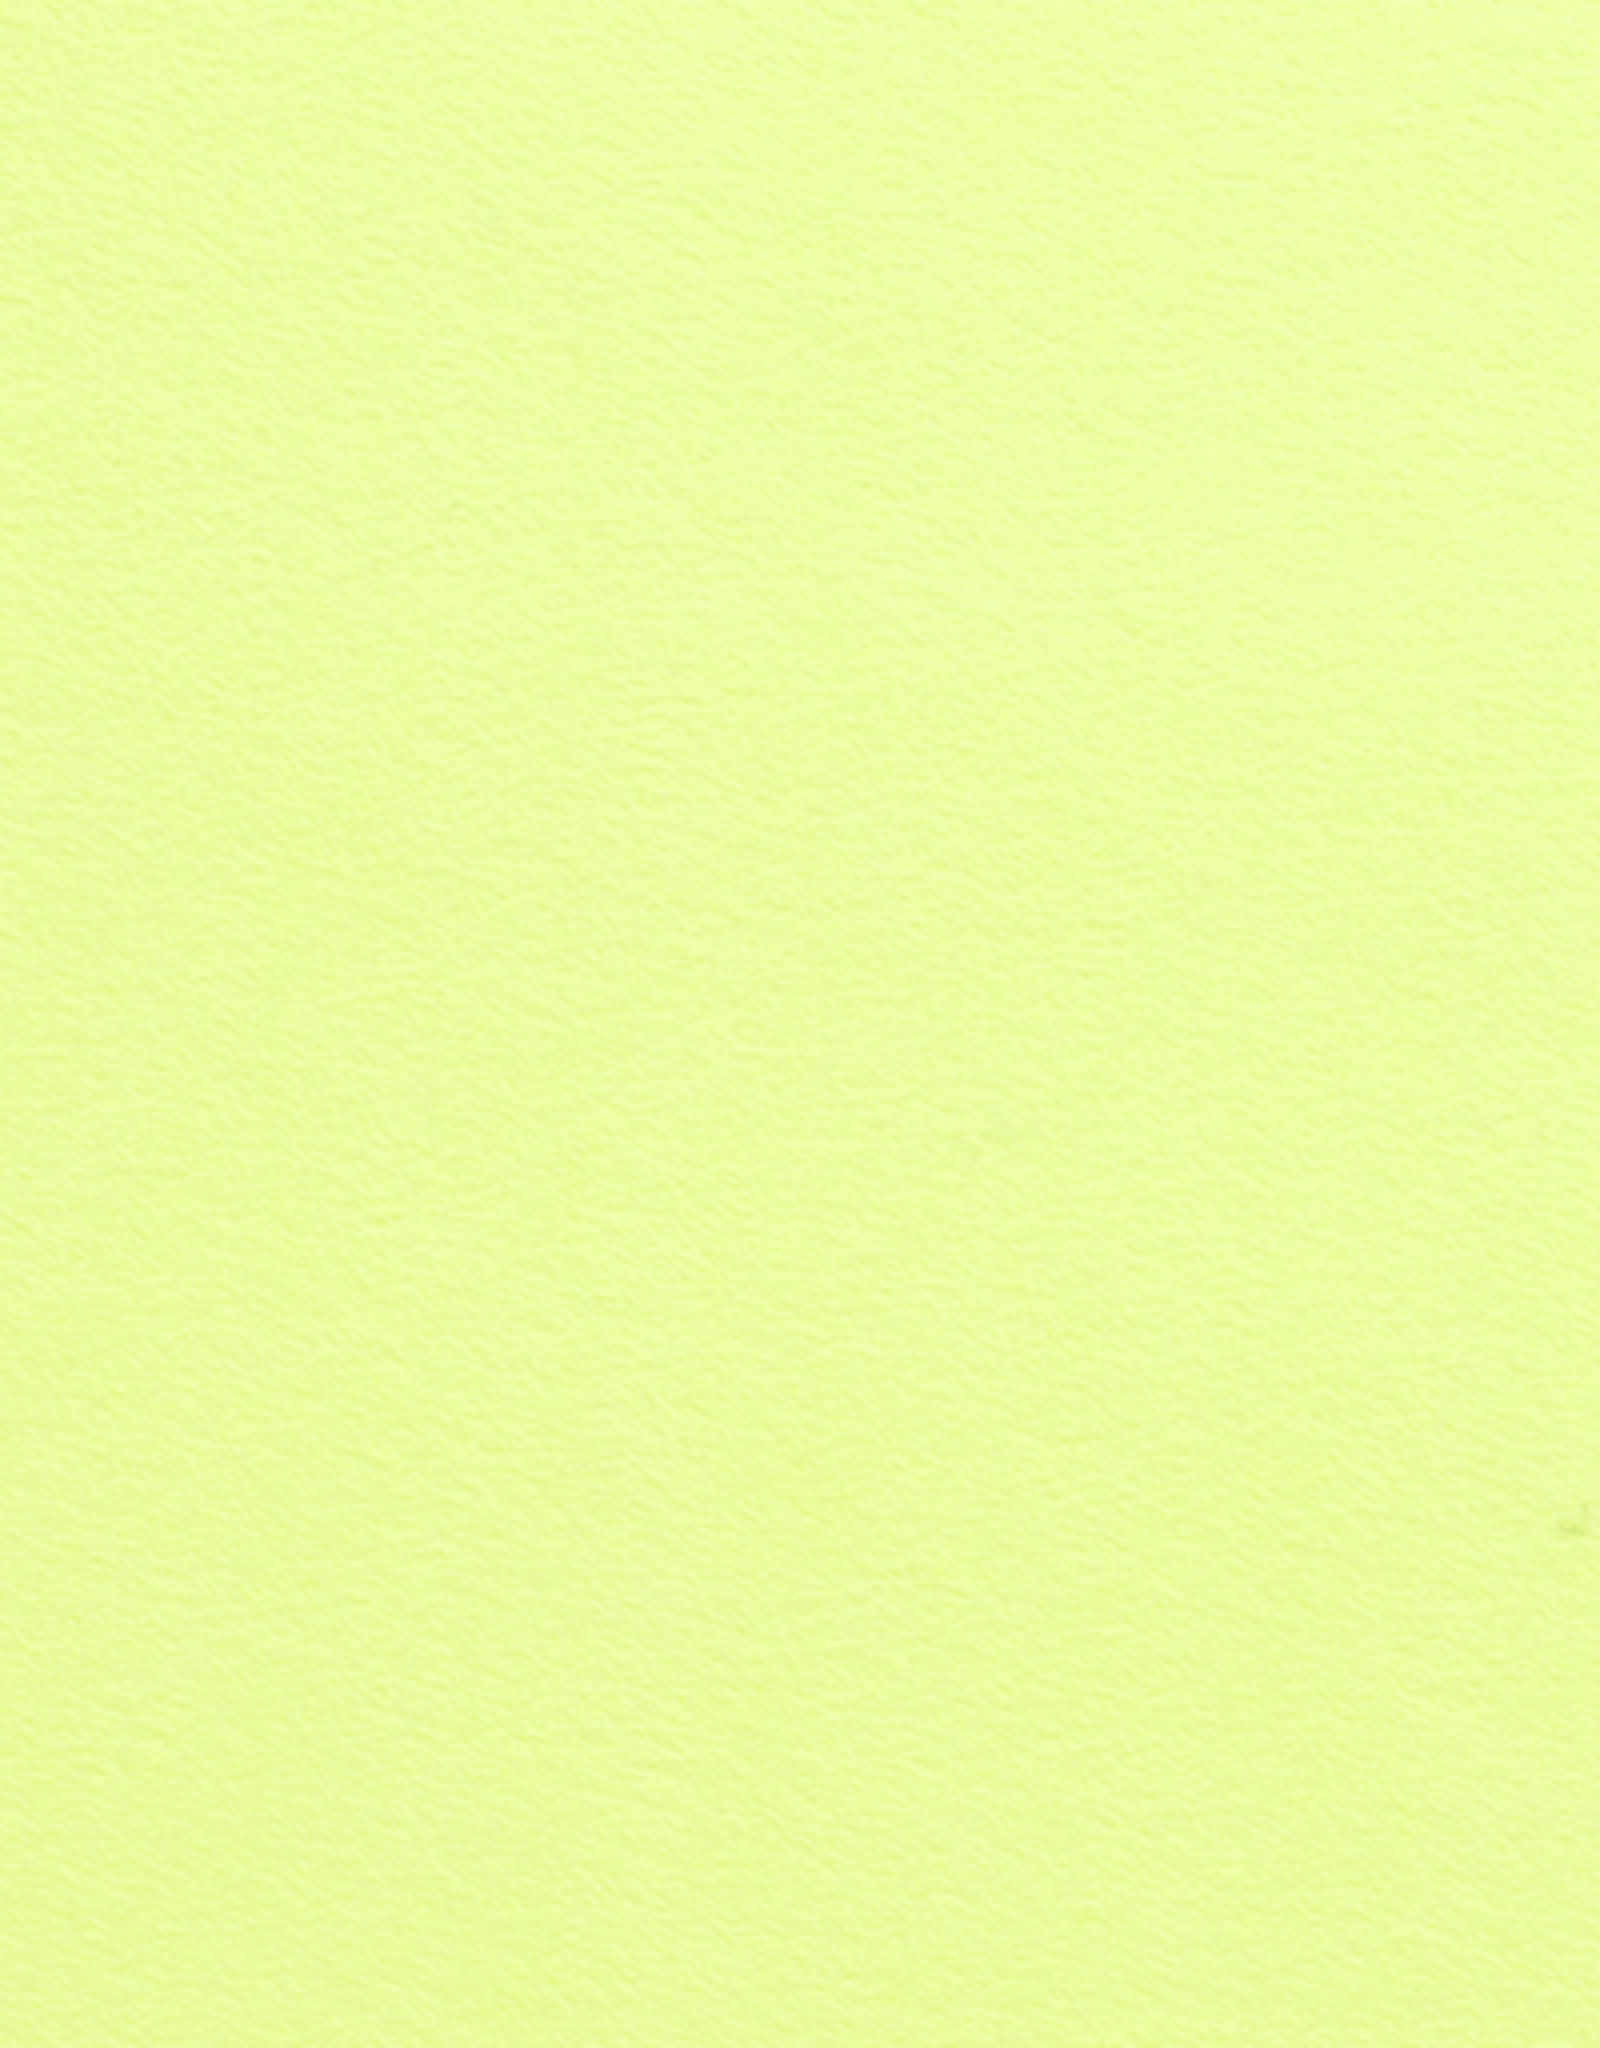 Vilt 1mm fluo neongeel per vel 20x30cm